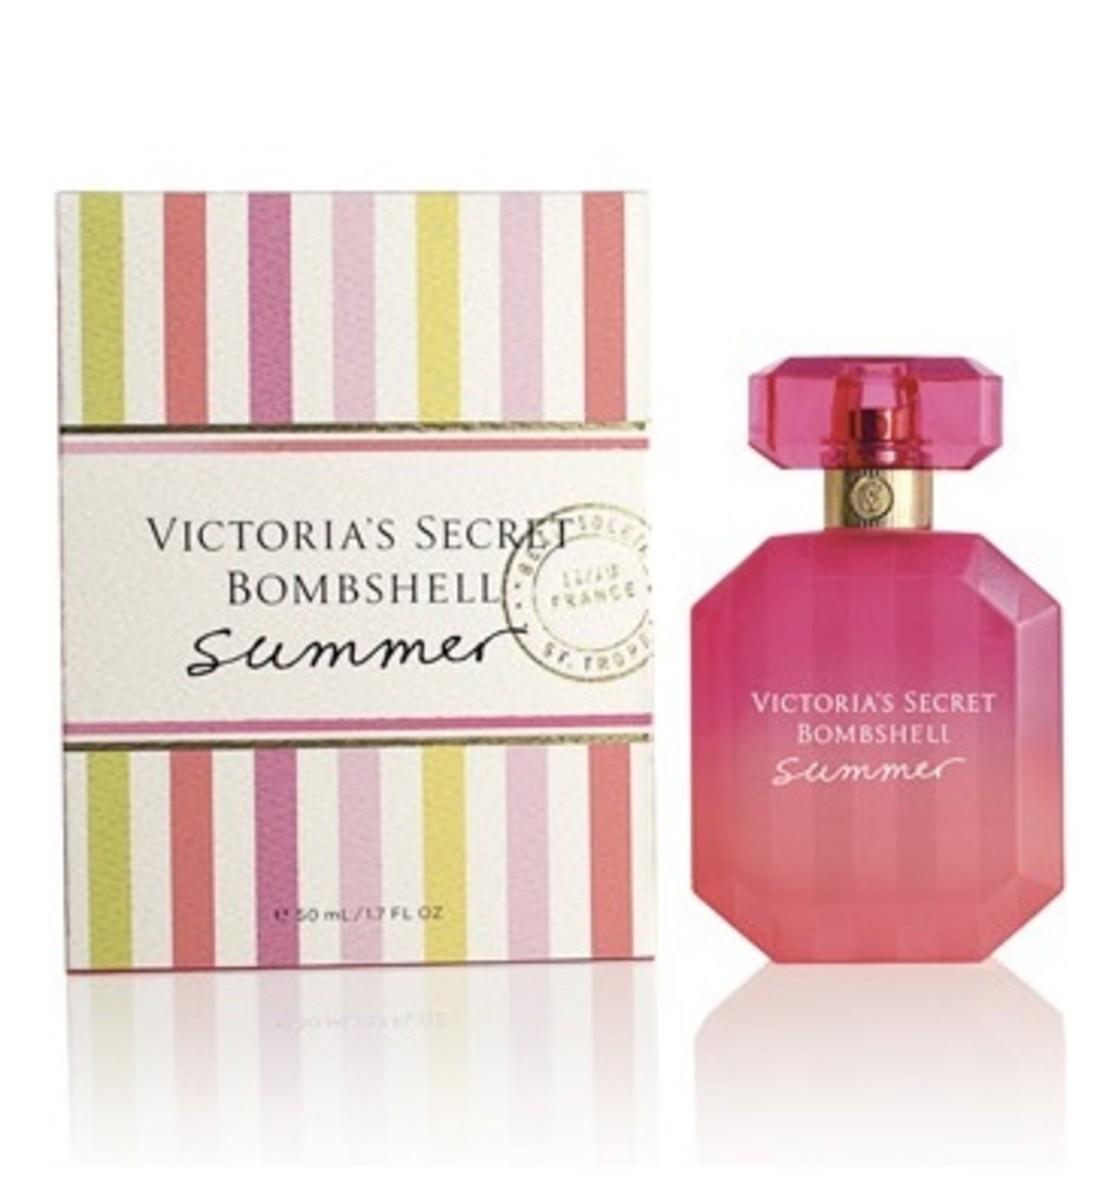 Victorias-Secret-Bombshell-Summer